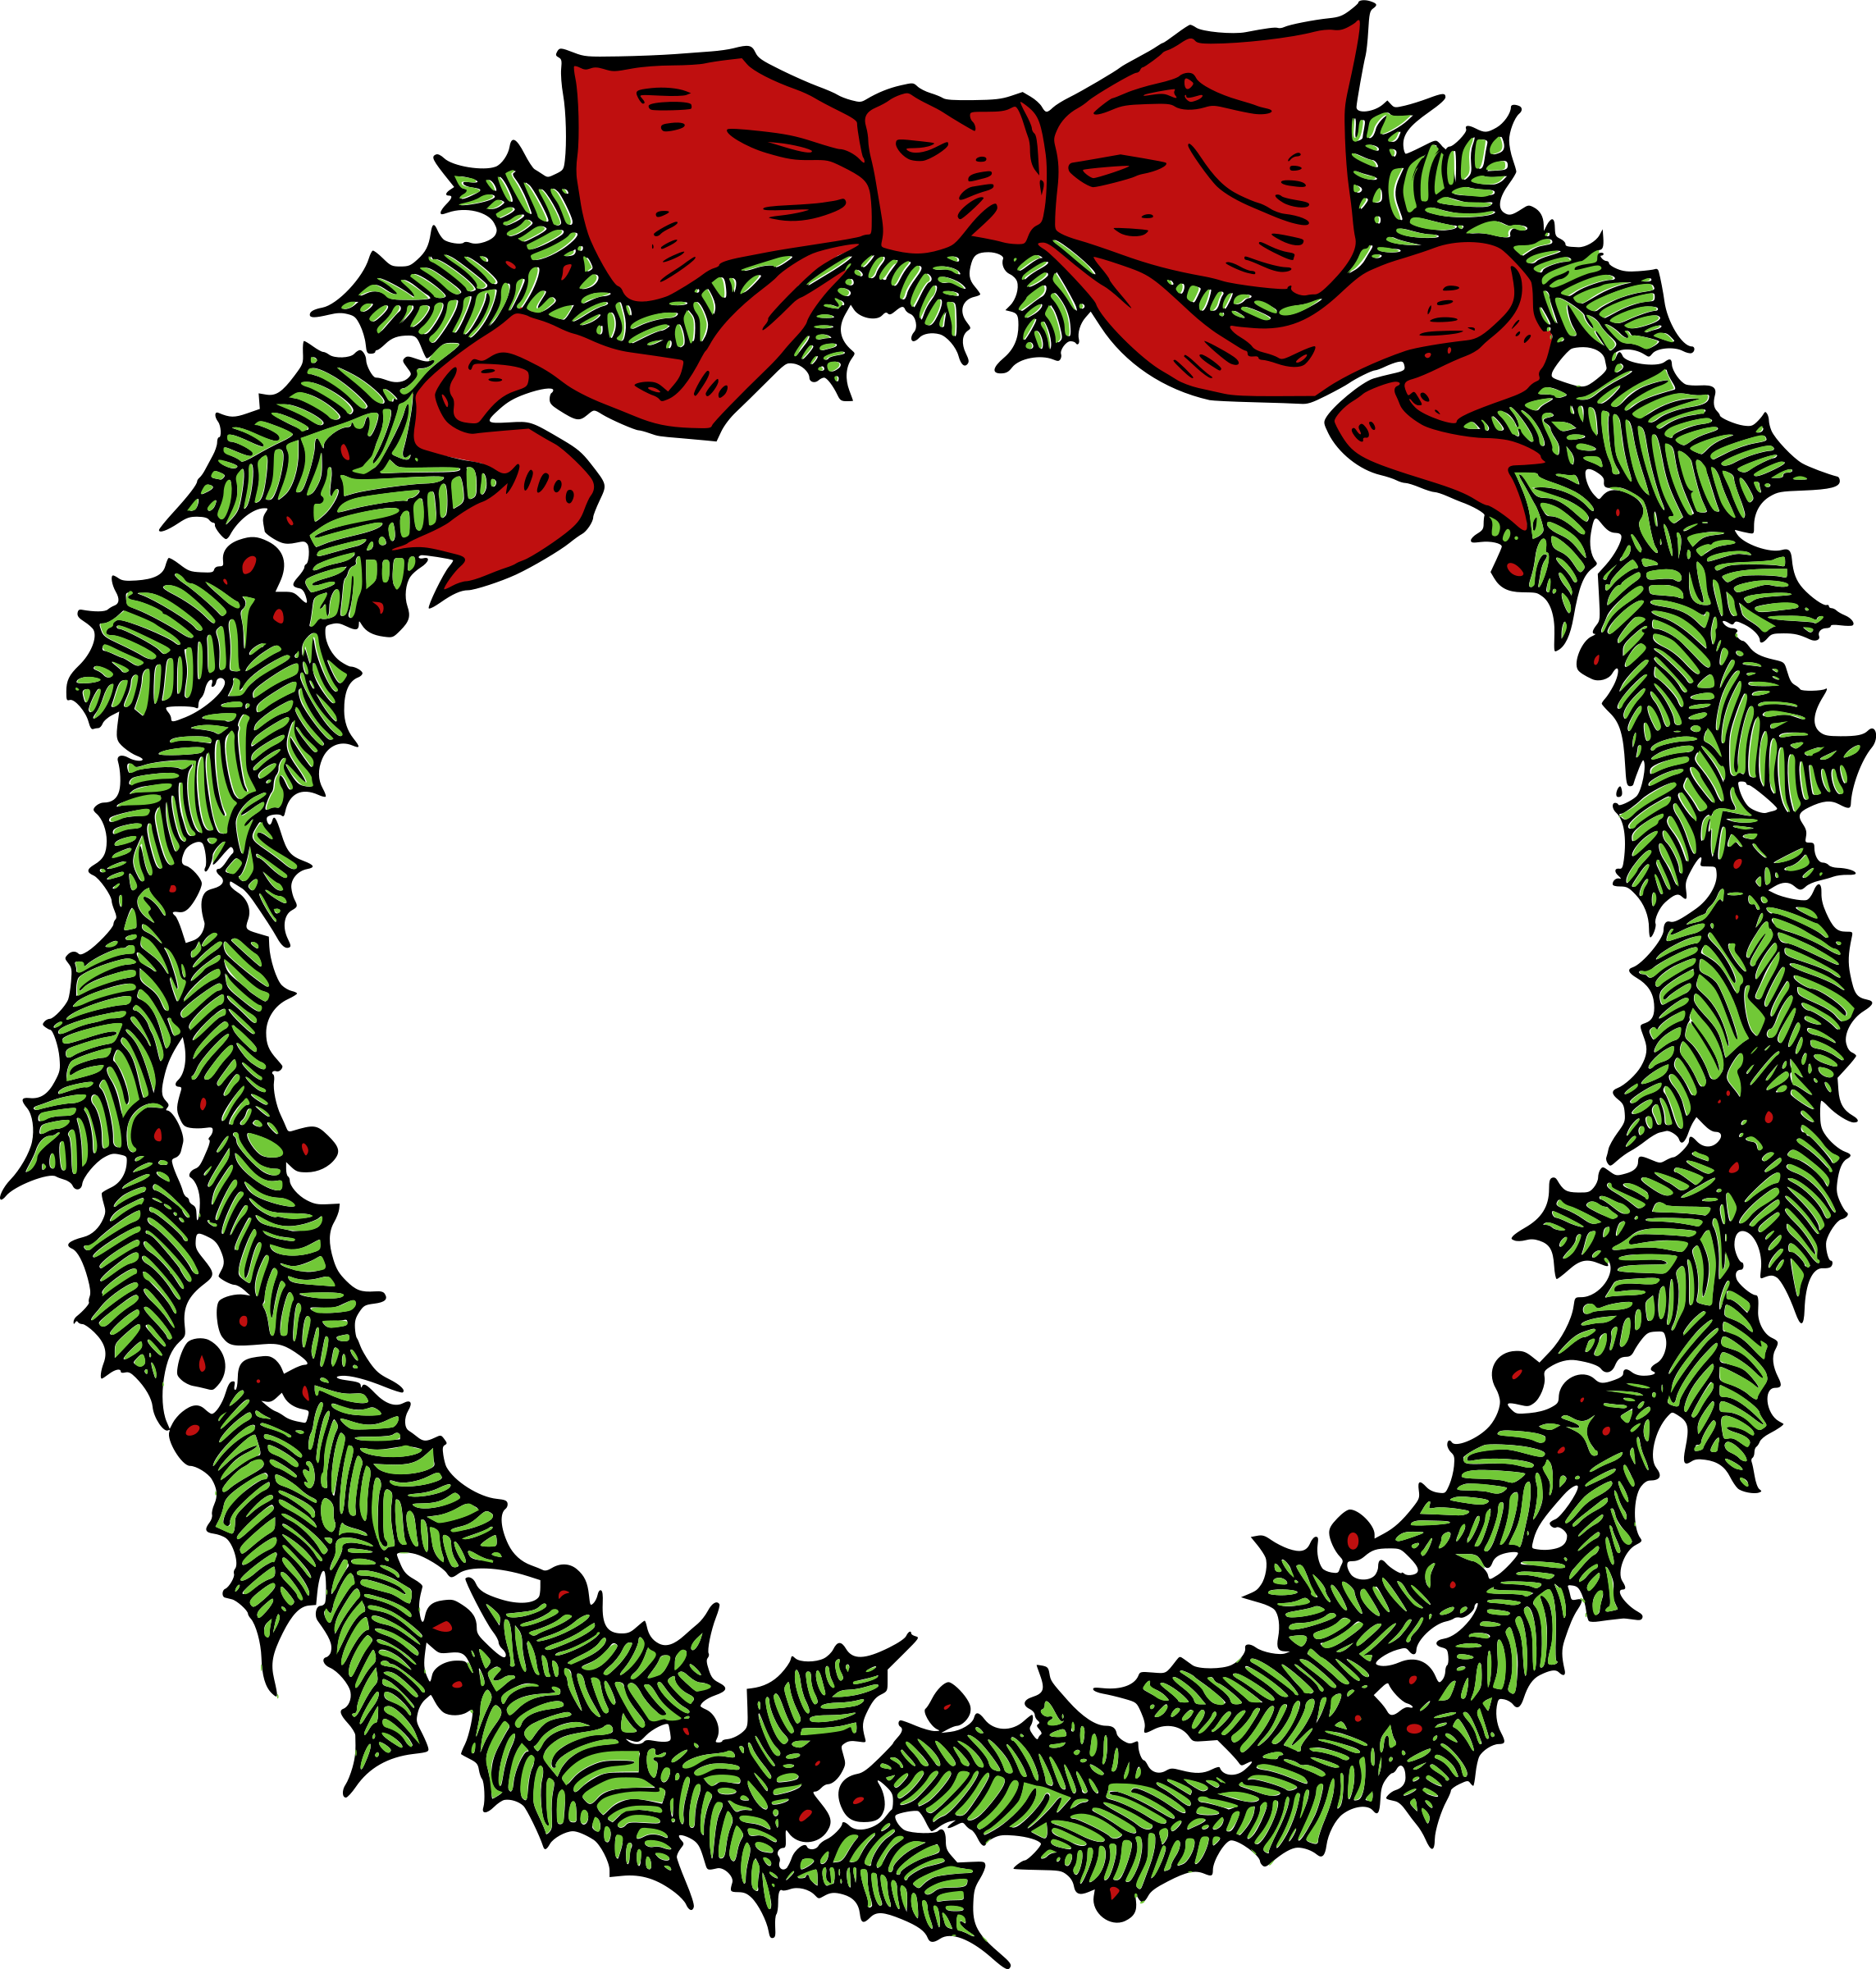 December clipart wreath. Big image png